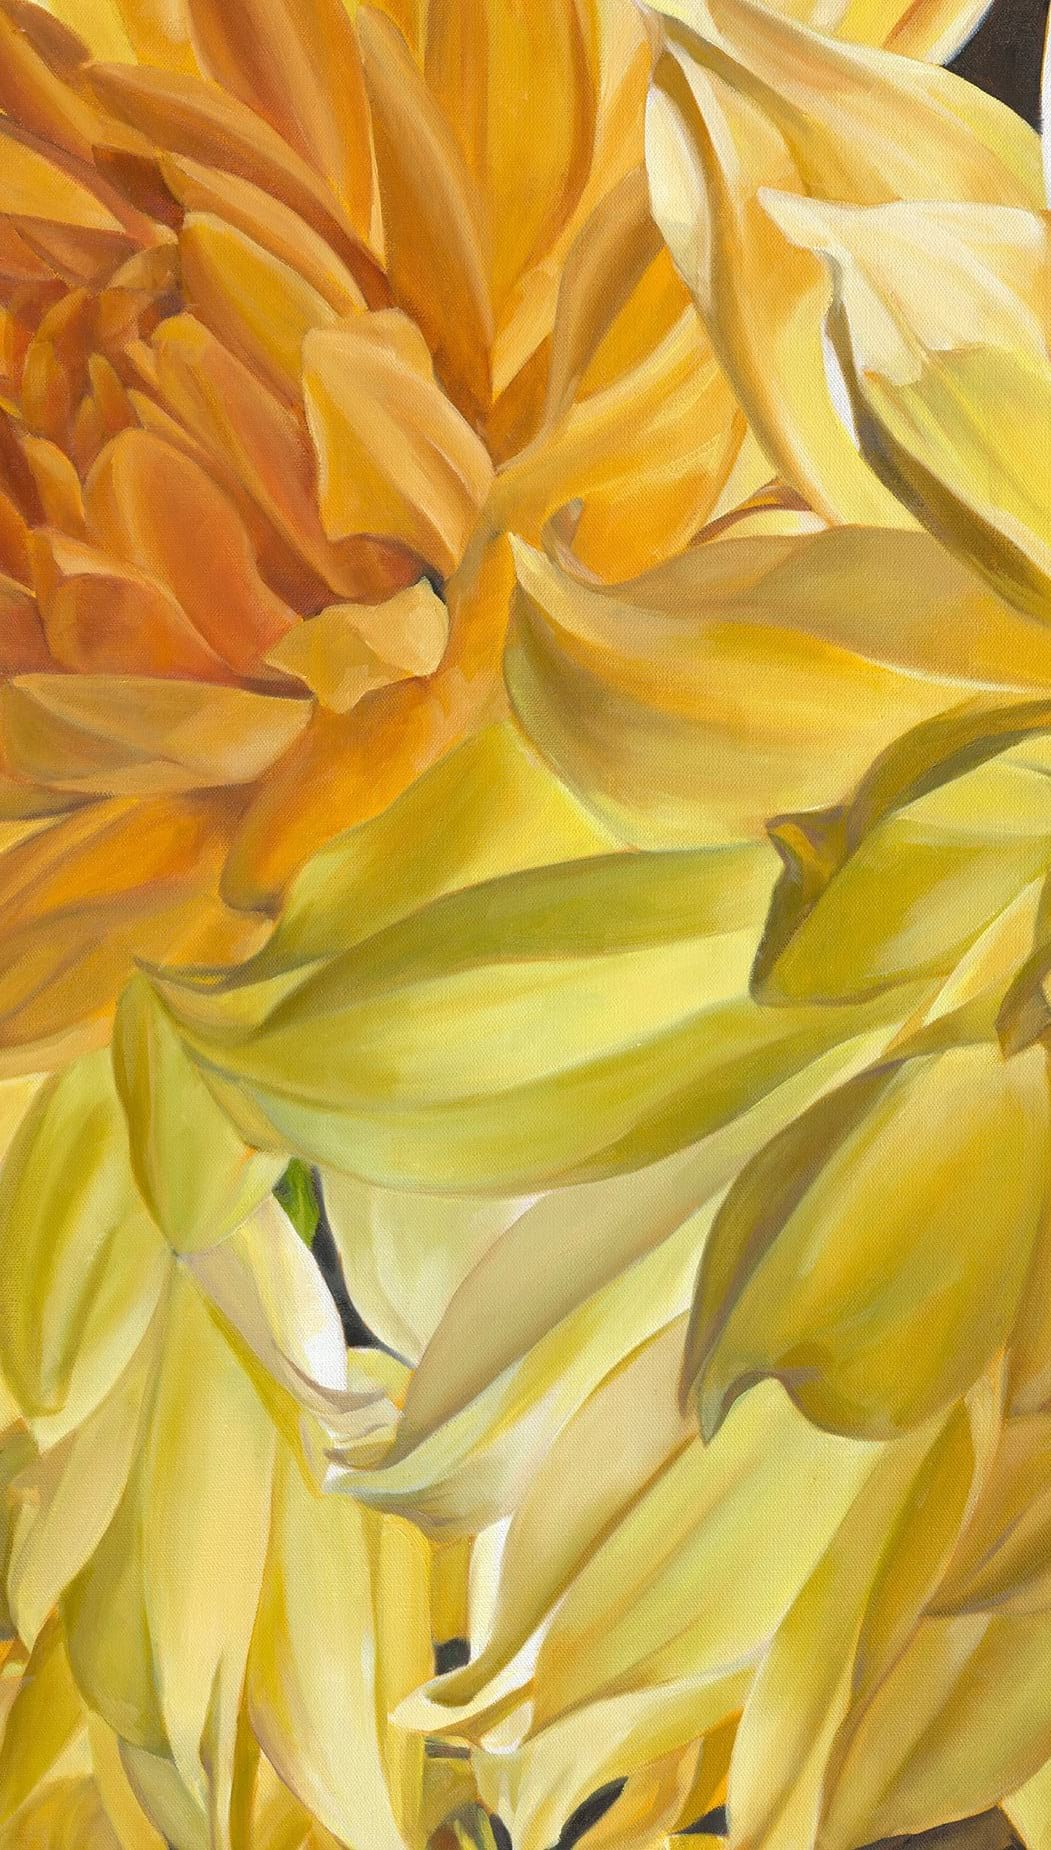 Oil on canvas painting of Dahlias in Autumn by Stephanie Neely